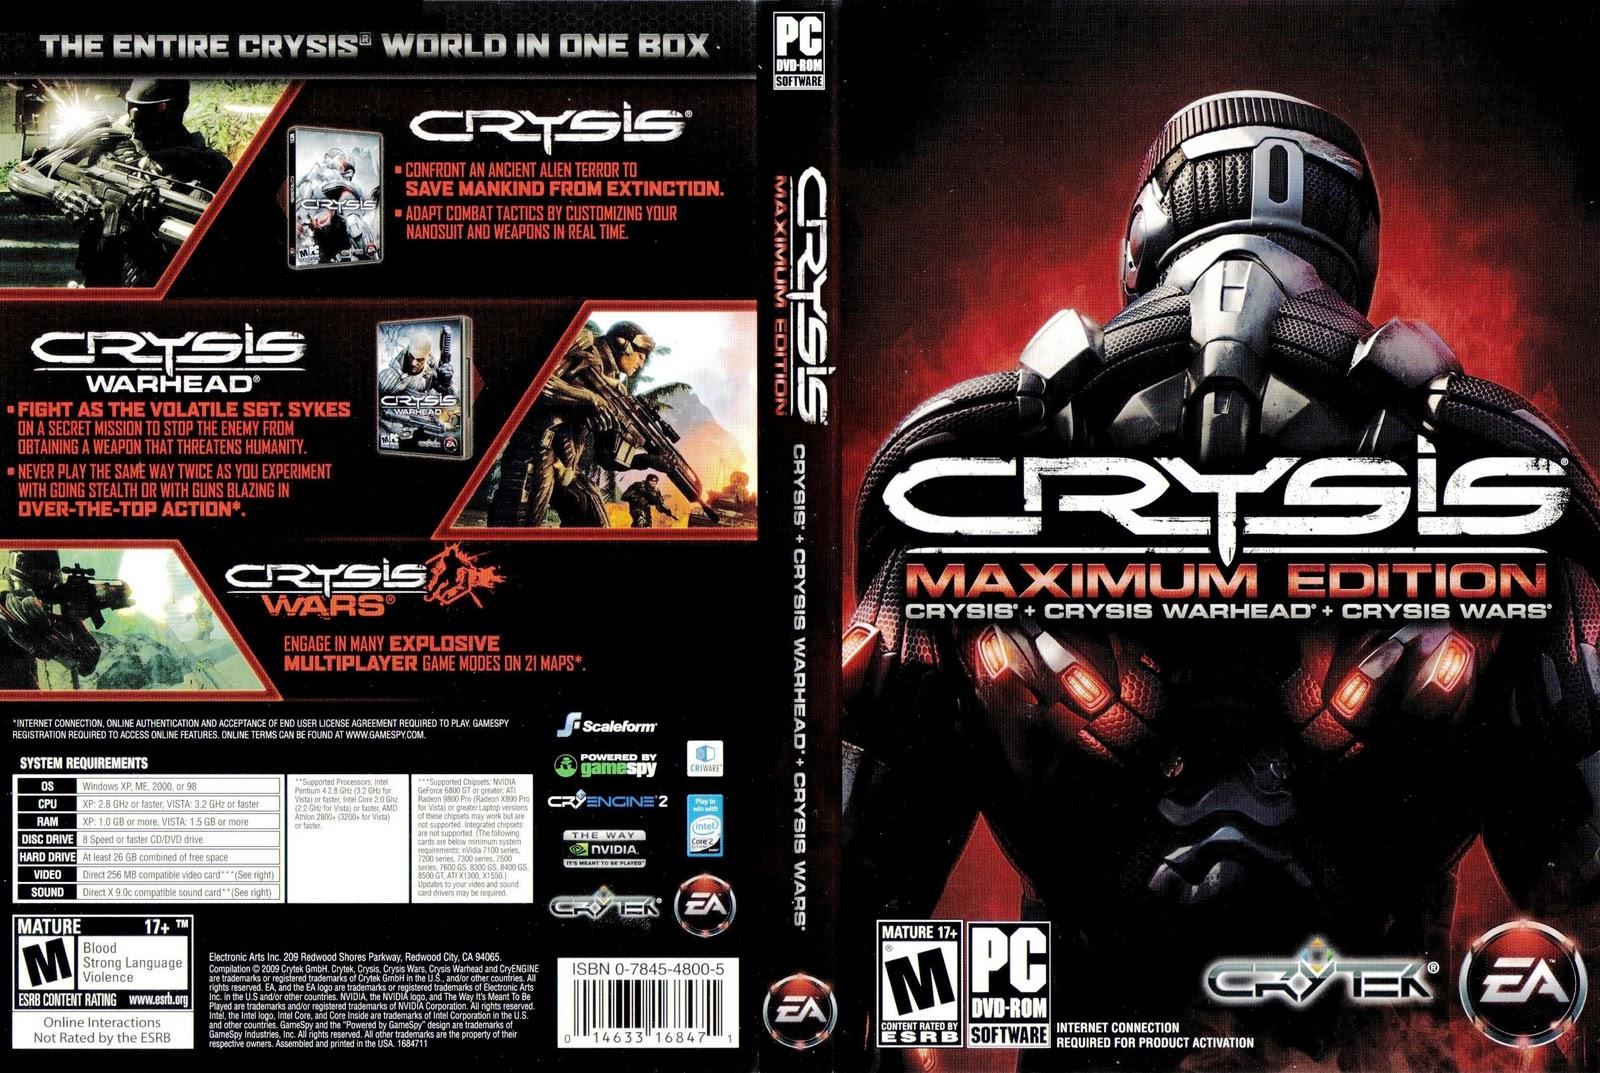 Crysis Maximum Edition - Official EA Site